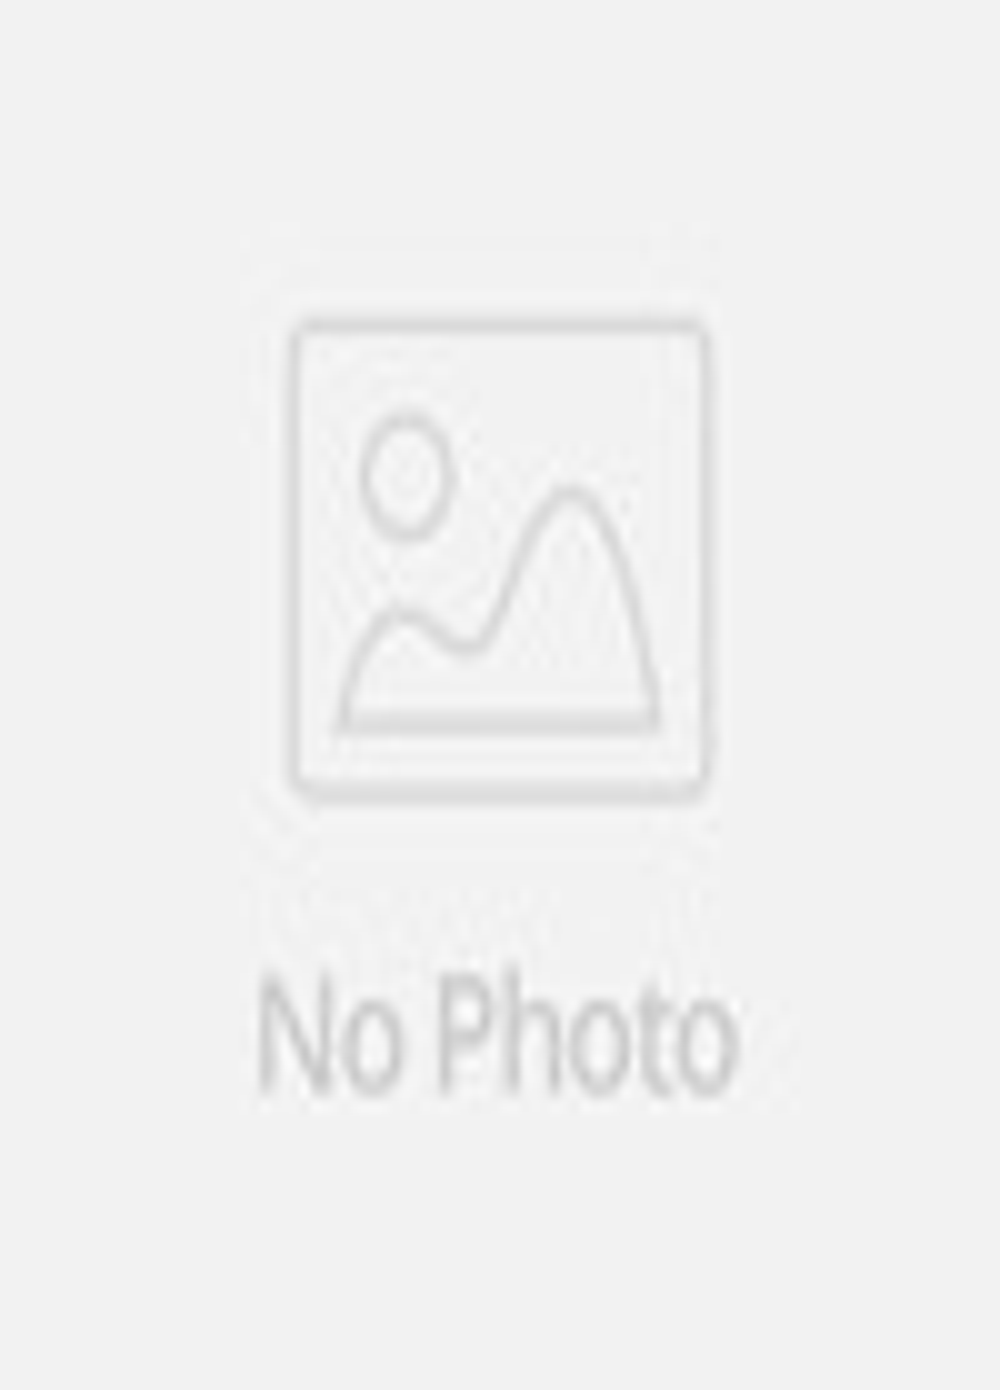 2014 Turquoise Quinceanera Dress Beading Halter Vestidos De 15 Anos    Quinceanera Dresses 2014 Turquoise